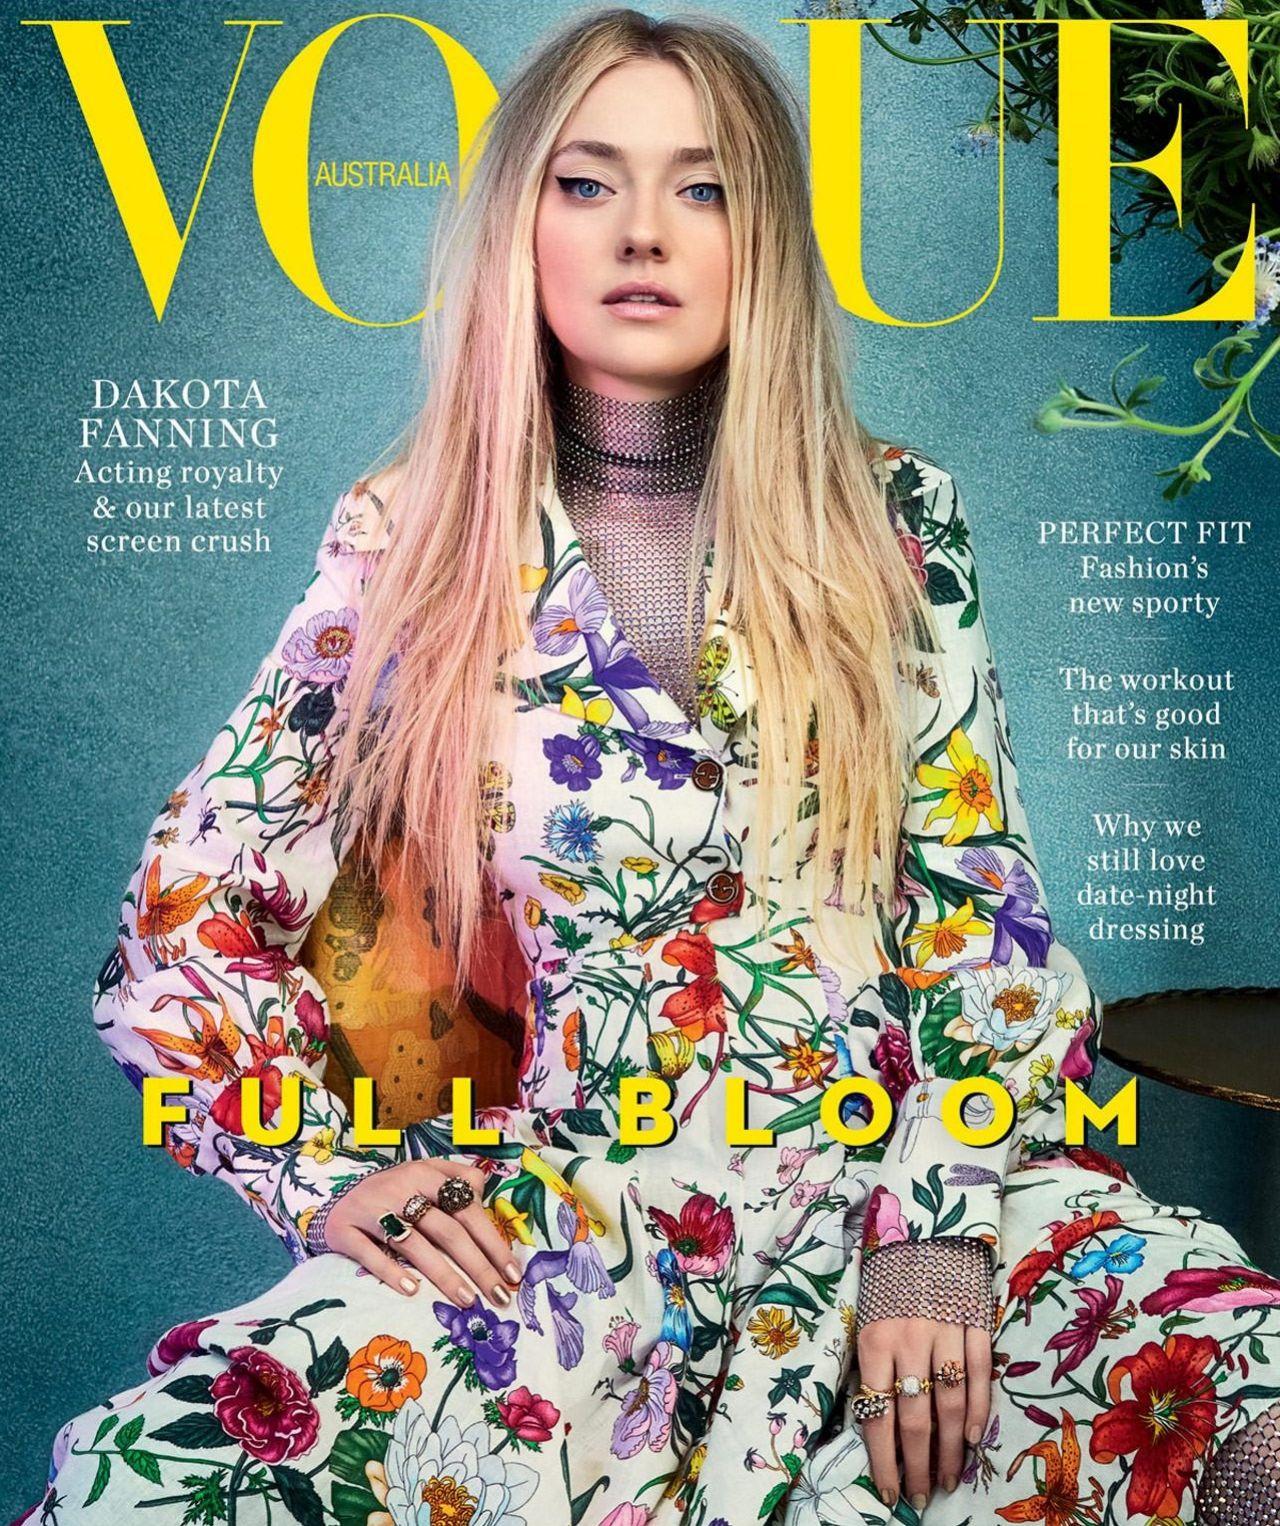 http://celebmafia.com/wp-content/uploads/2018/01/dakota-fanning-vogue-australia-february-2018-2.jpg